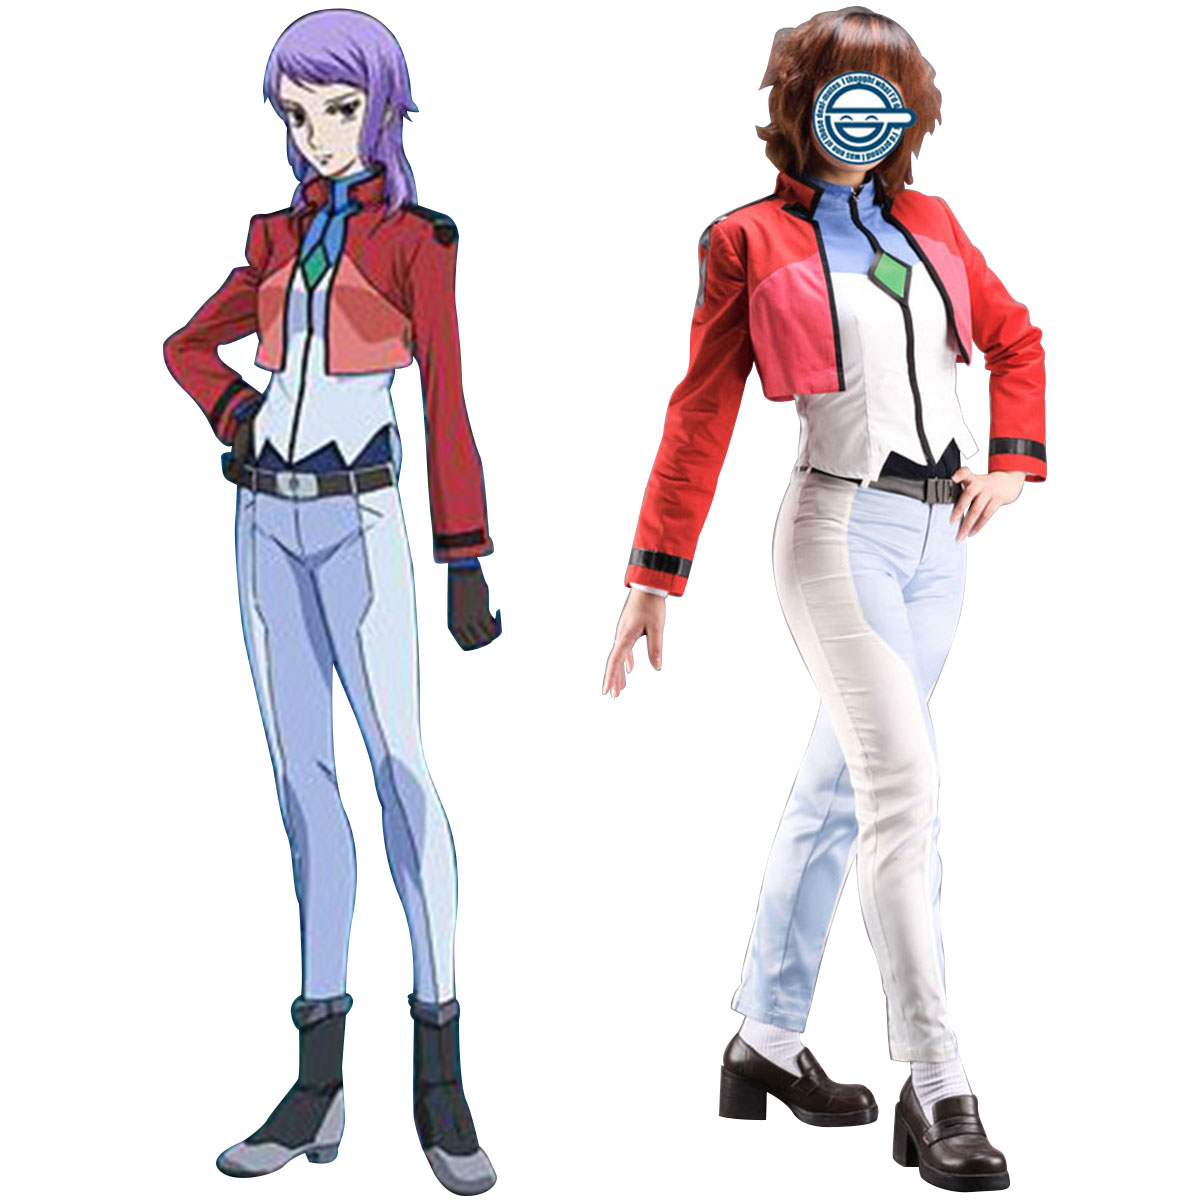 Kläder Gundam 00 Ainiu Celestial Being Cosplay Karneval Kläder